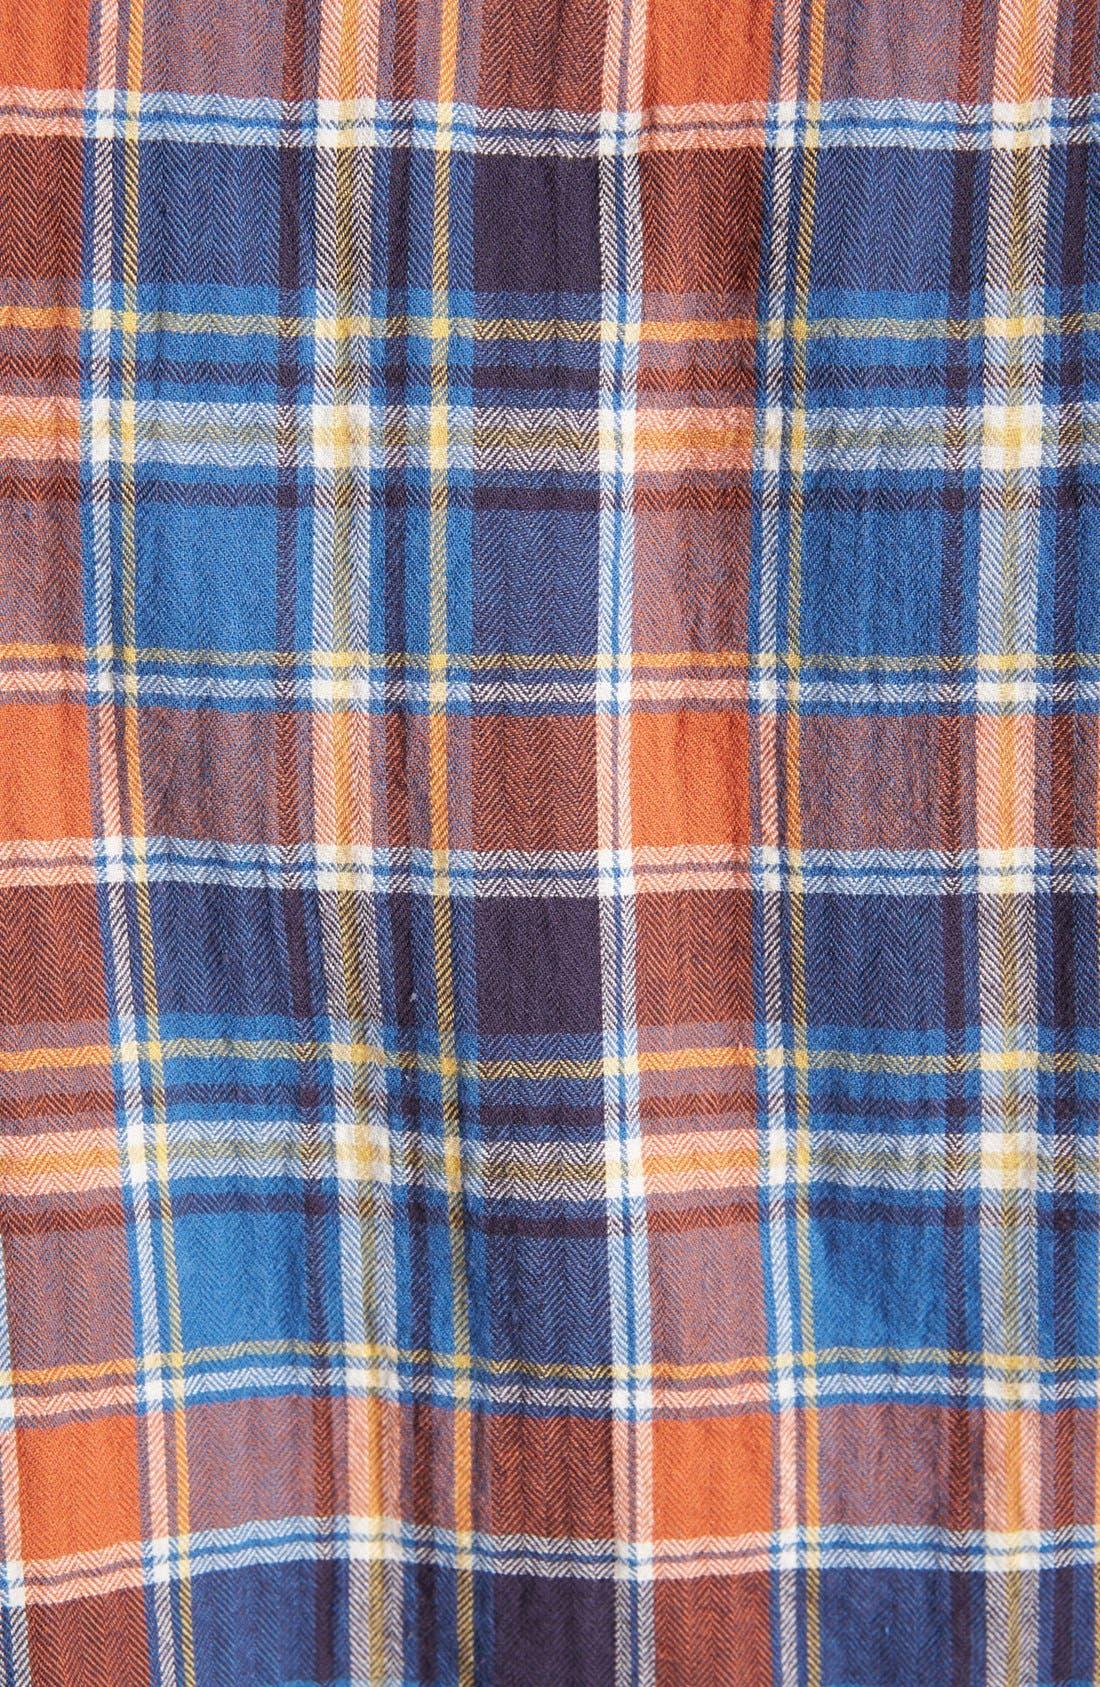 Alternate Image 3  - rag & bone 'Beach' Herringbone Plaid Woven Shirt